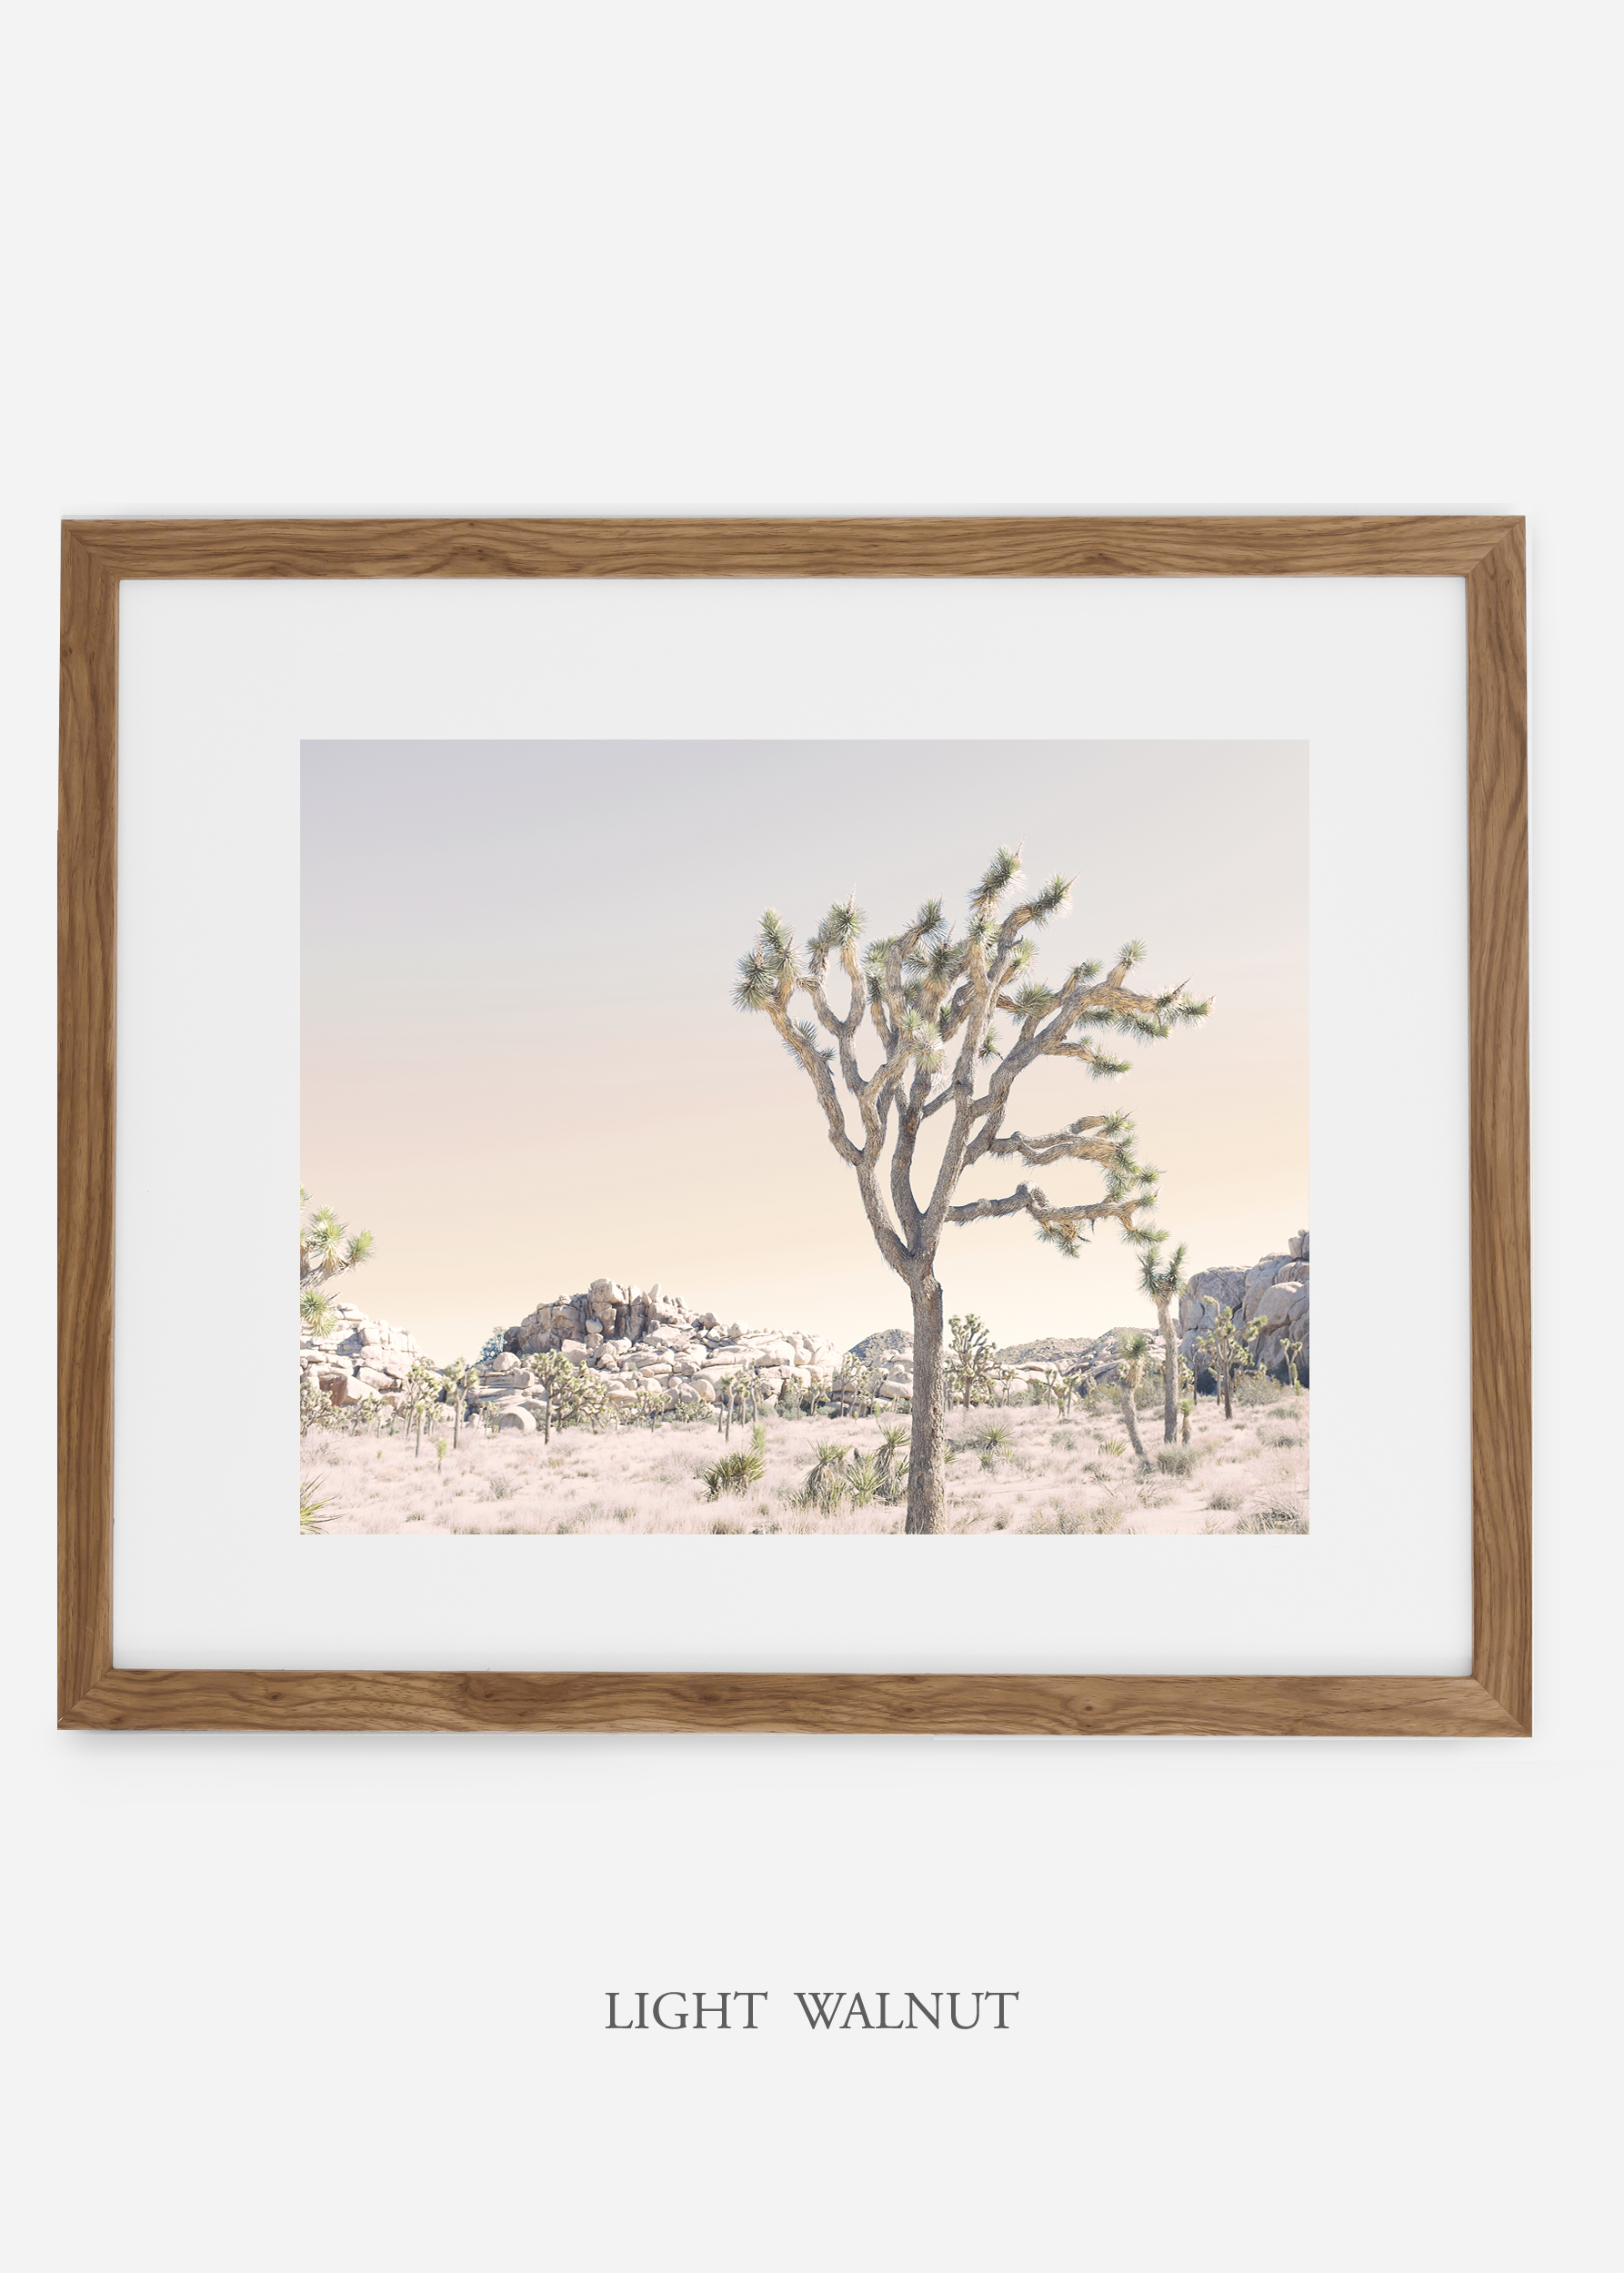 WilderCalifornia_lightwalnutframe_JoshuaTree_No.3_interiordesign_prints_art.jpg